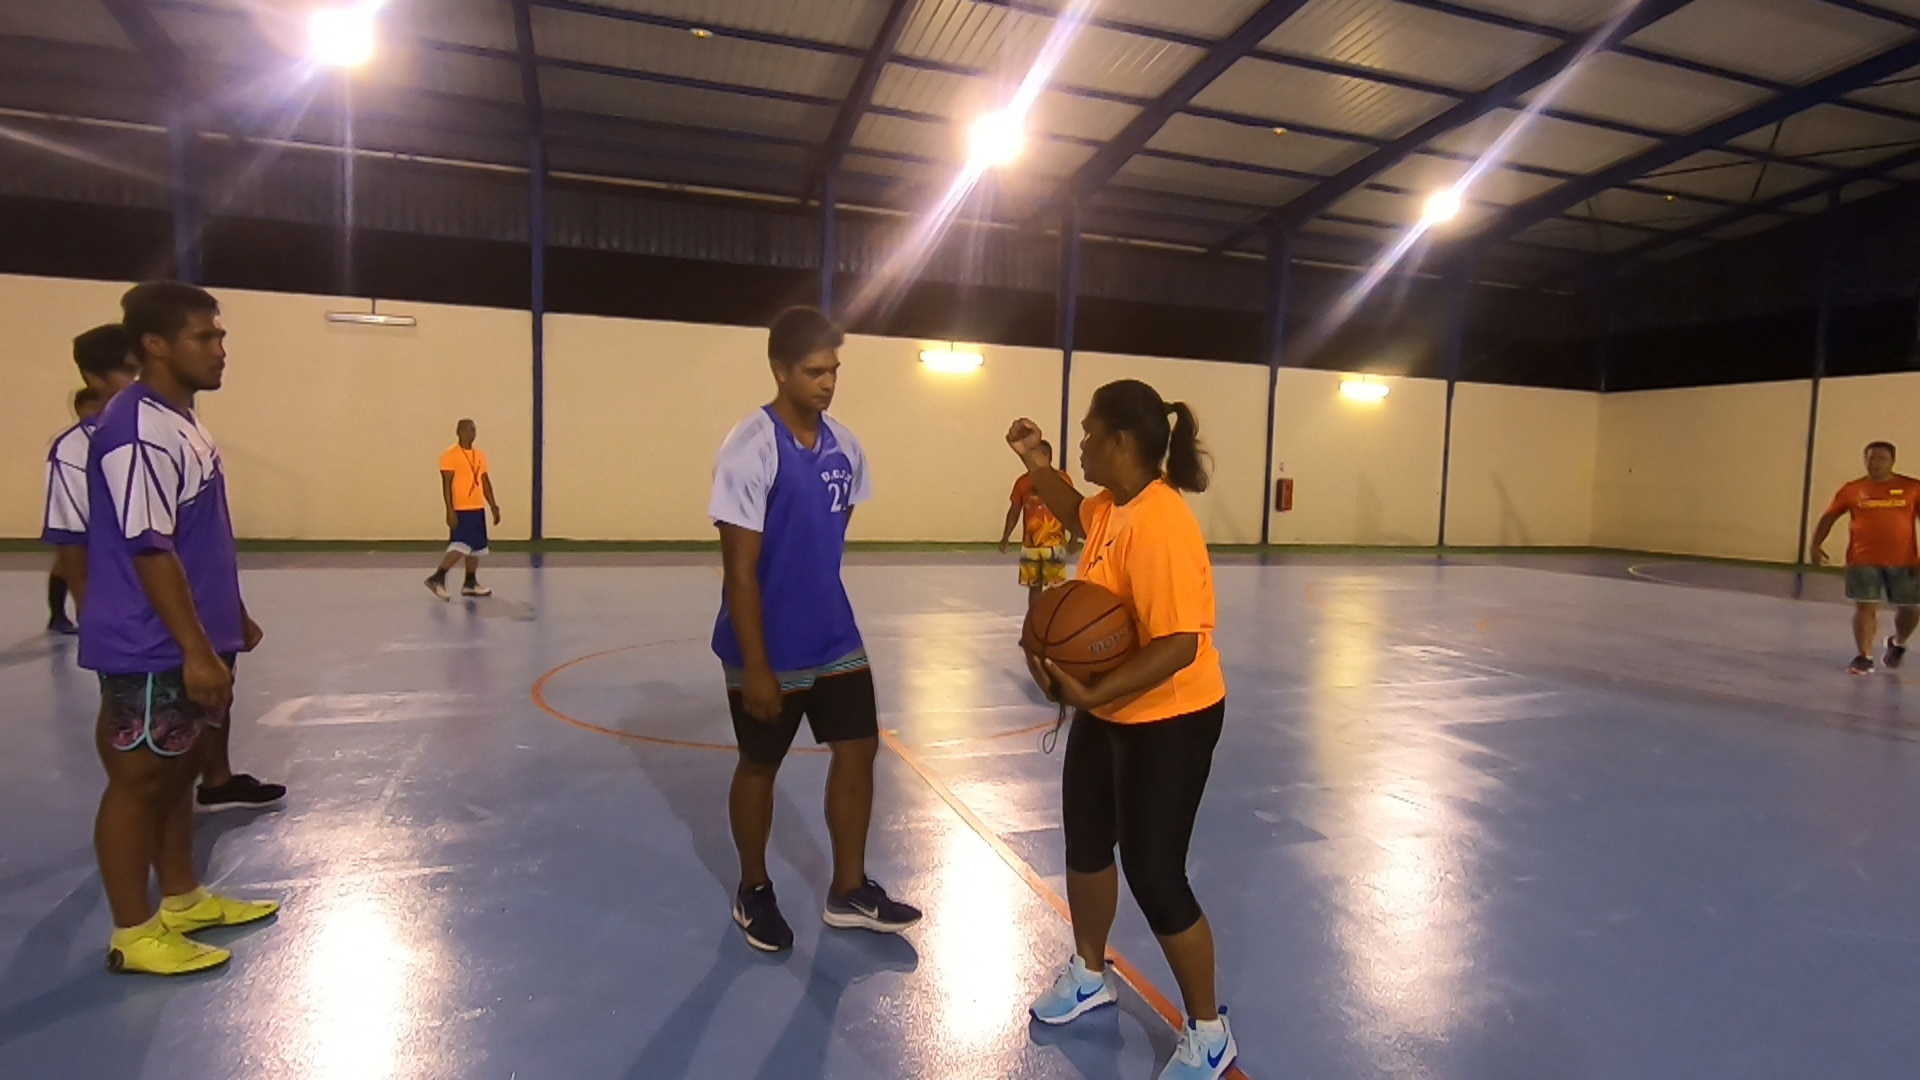 Le basket reprend à Tumara'a